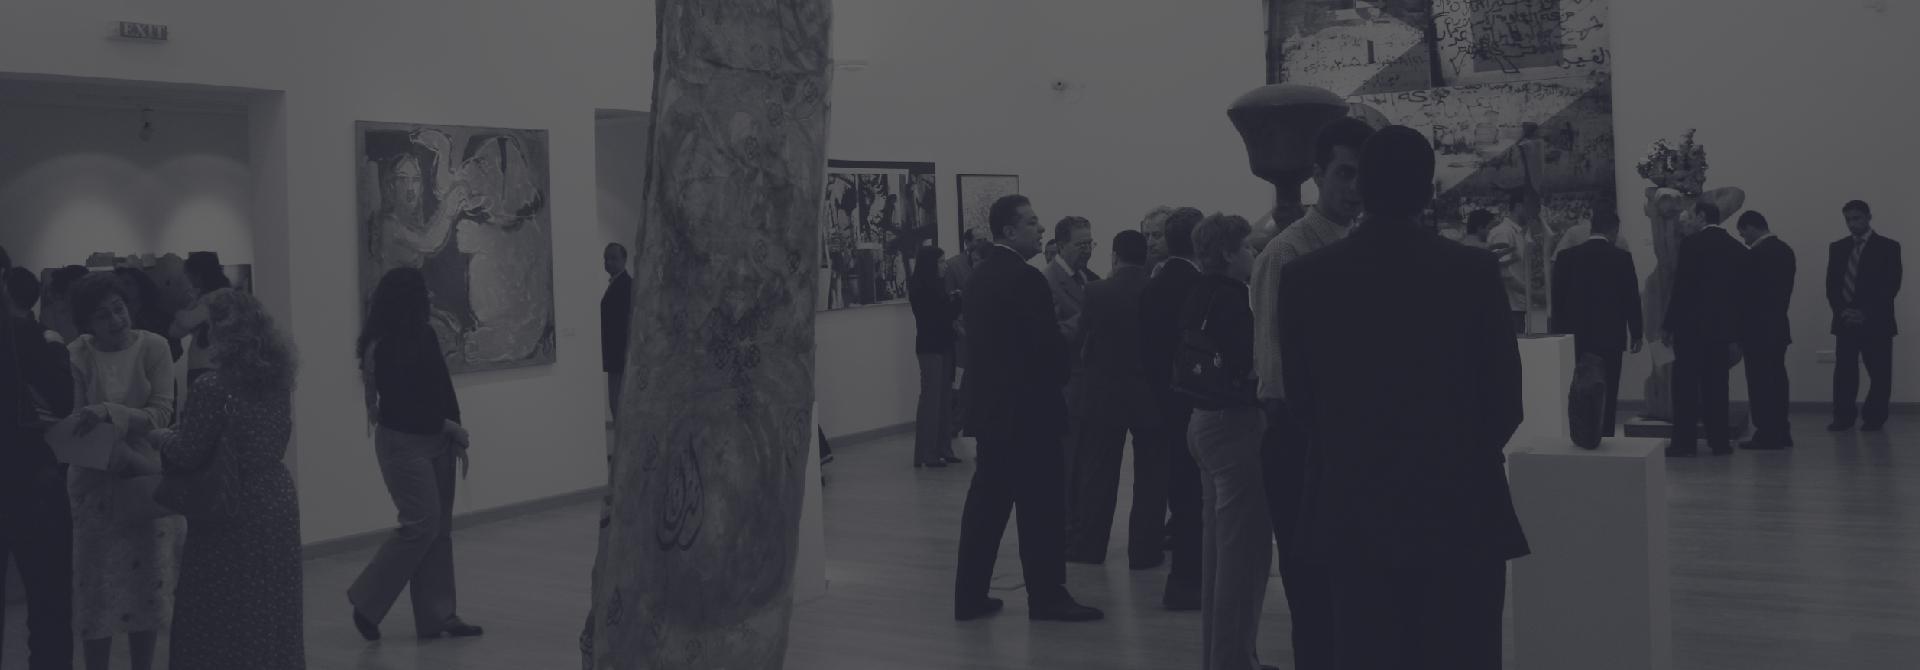 01 Jordan National Gallery